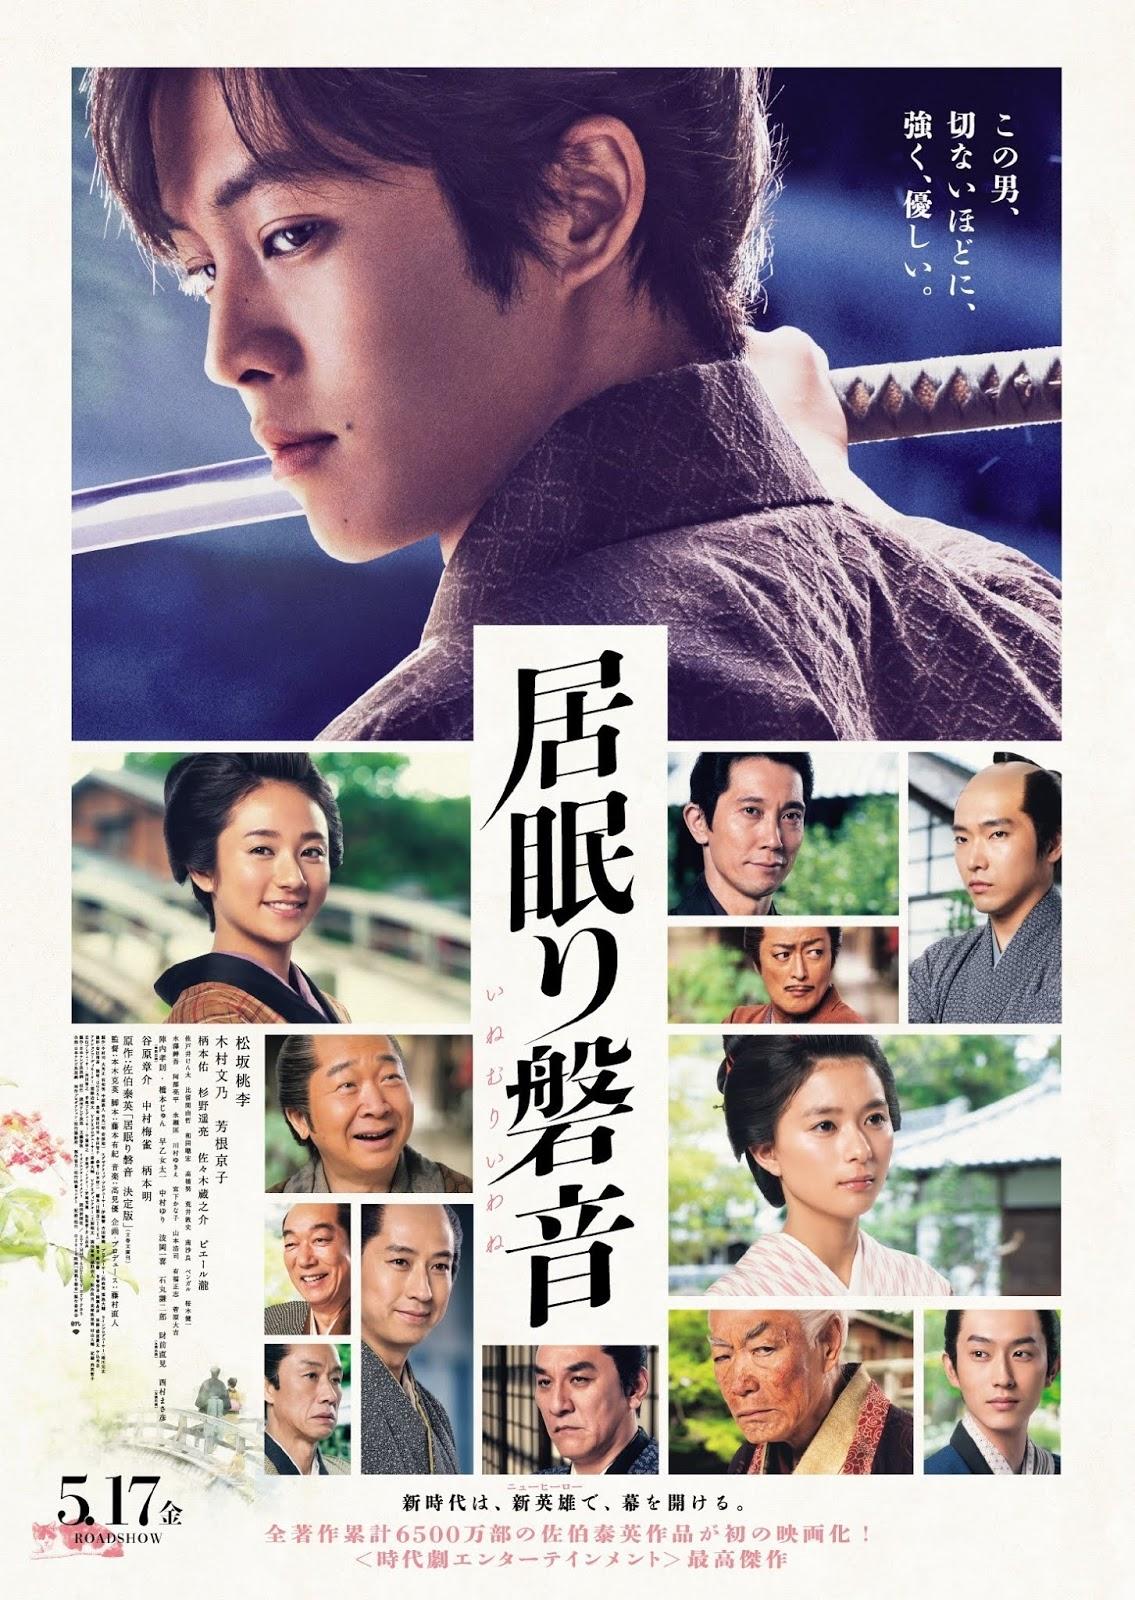 Inemuri Iwane - poster pelicula